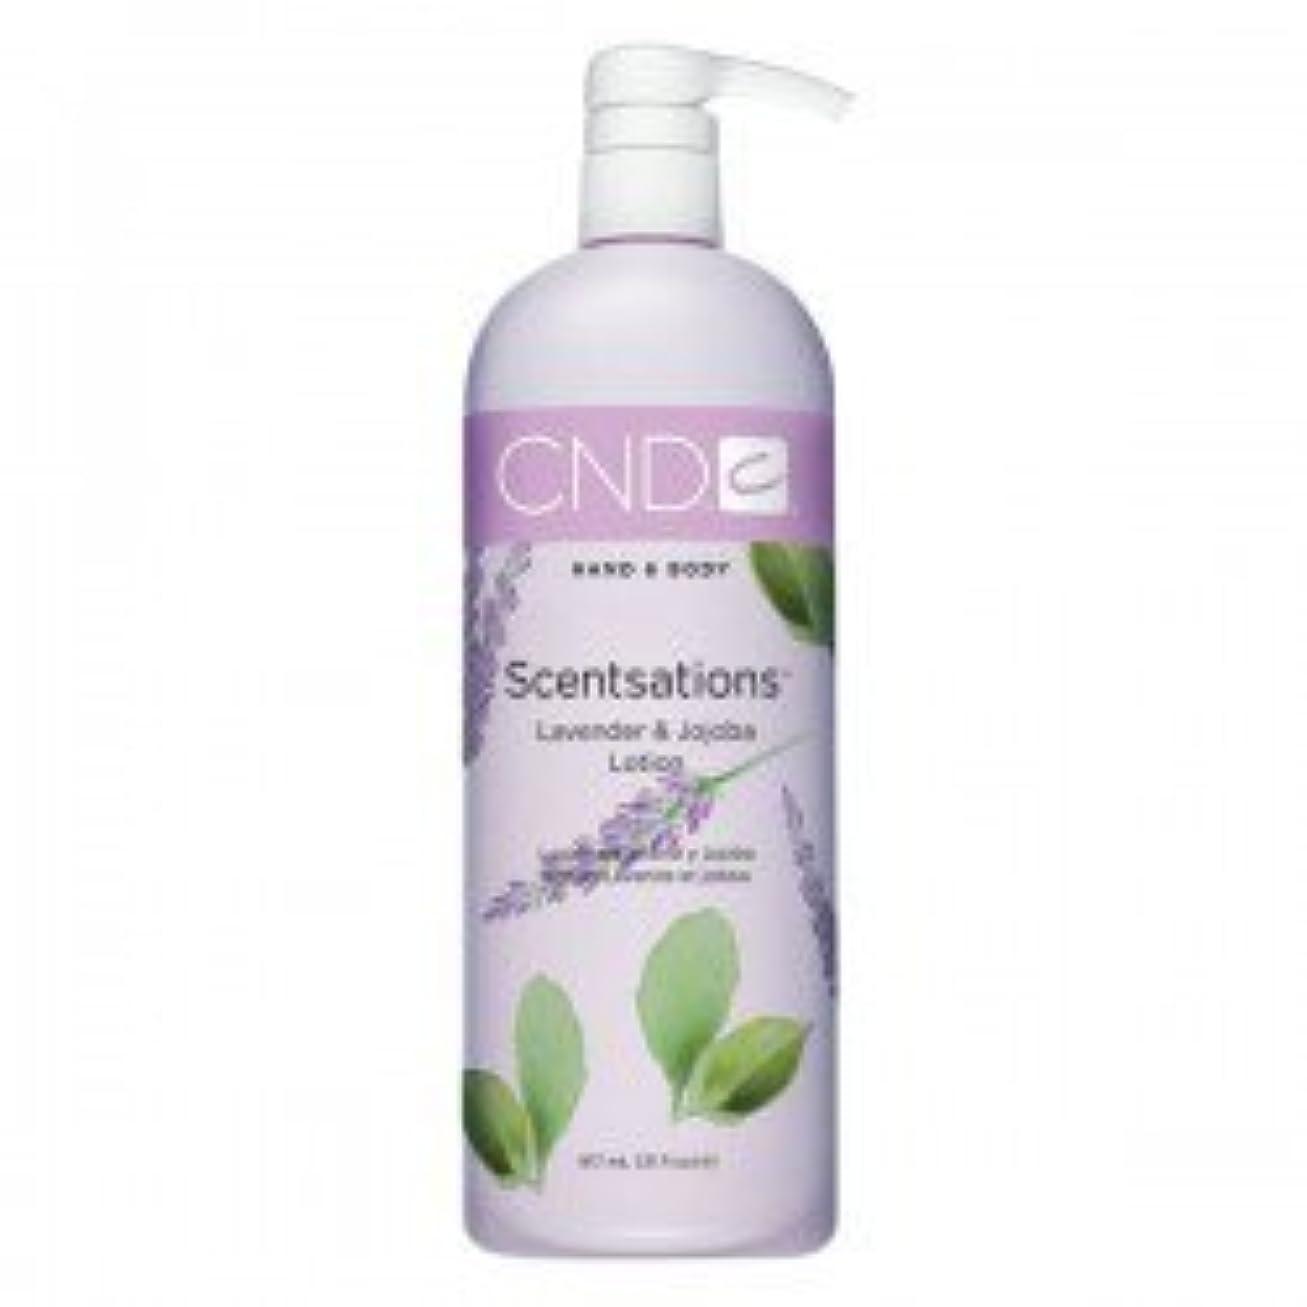 CND Scentsations Lavender & Jojoba Hand & Body Lotion - 33oz by Creative Nail [並行輸入品]